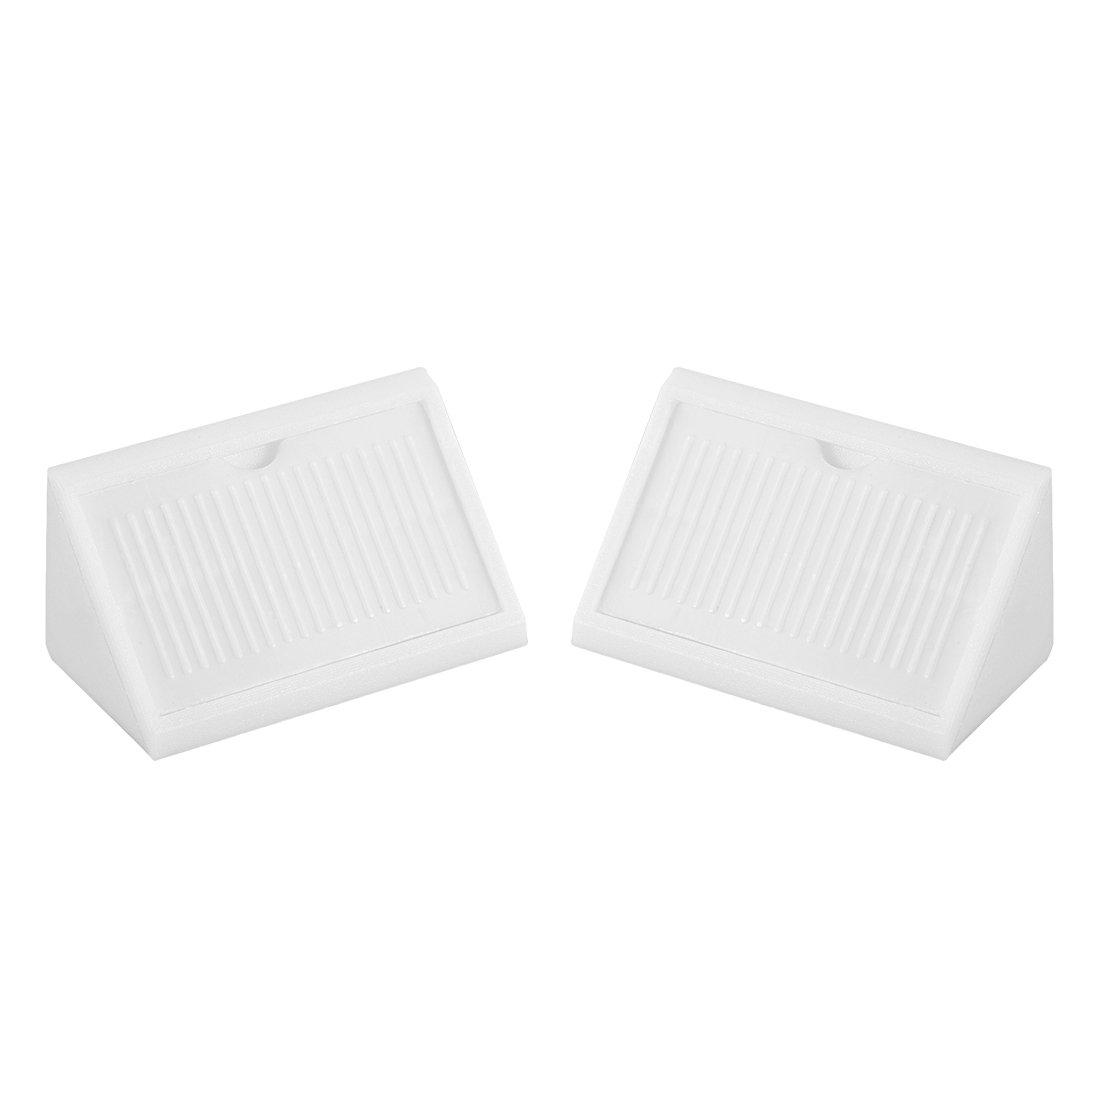 uxcell Shelf Door 42mmx20mmx20mm 4 Holes Plastic Corner Braces Angle Brackets White 100 Pcs